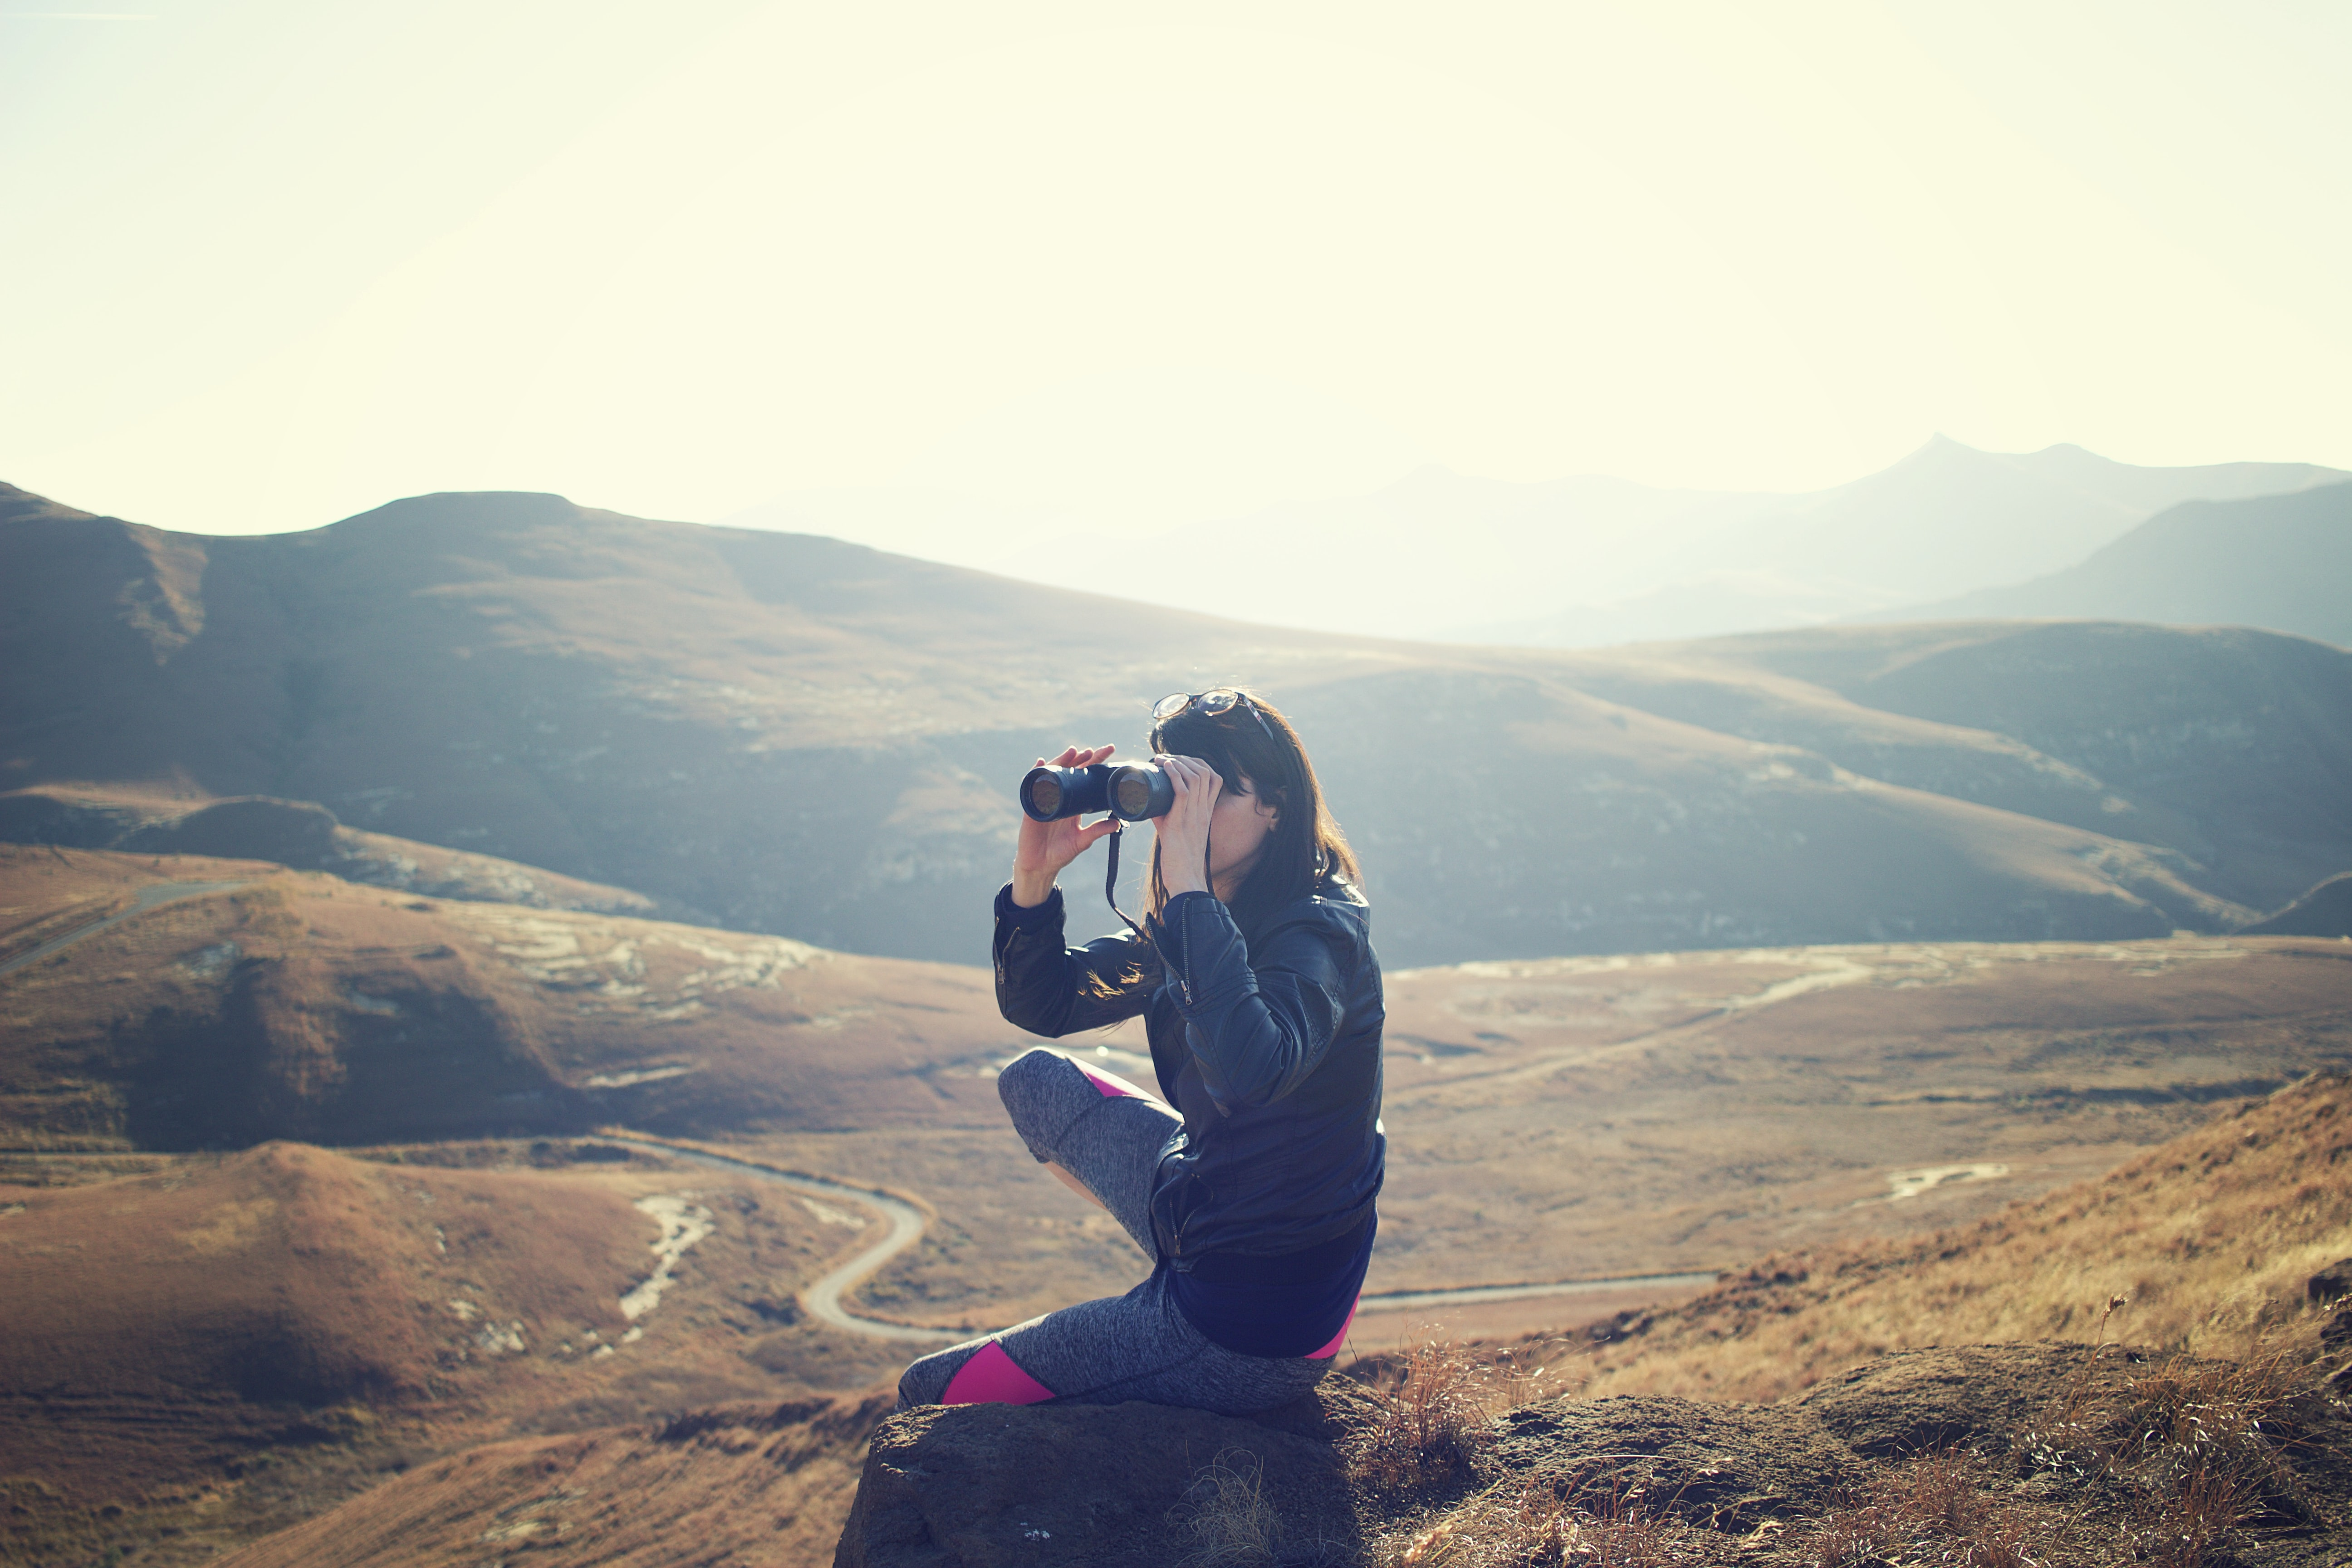 woman wearing black jacket sitting on gray rock and using binoculrs